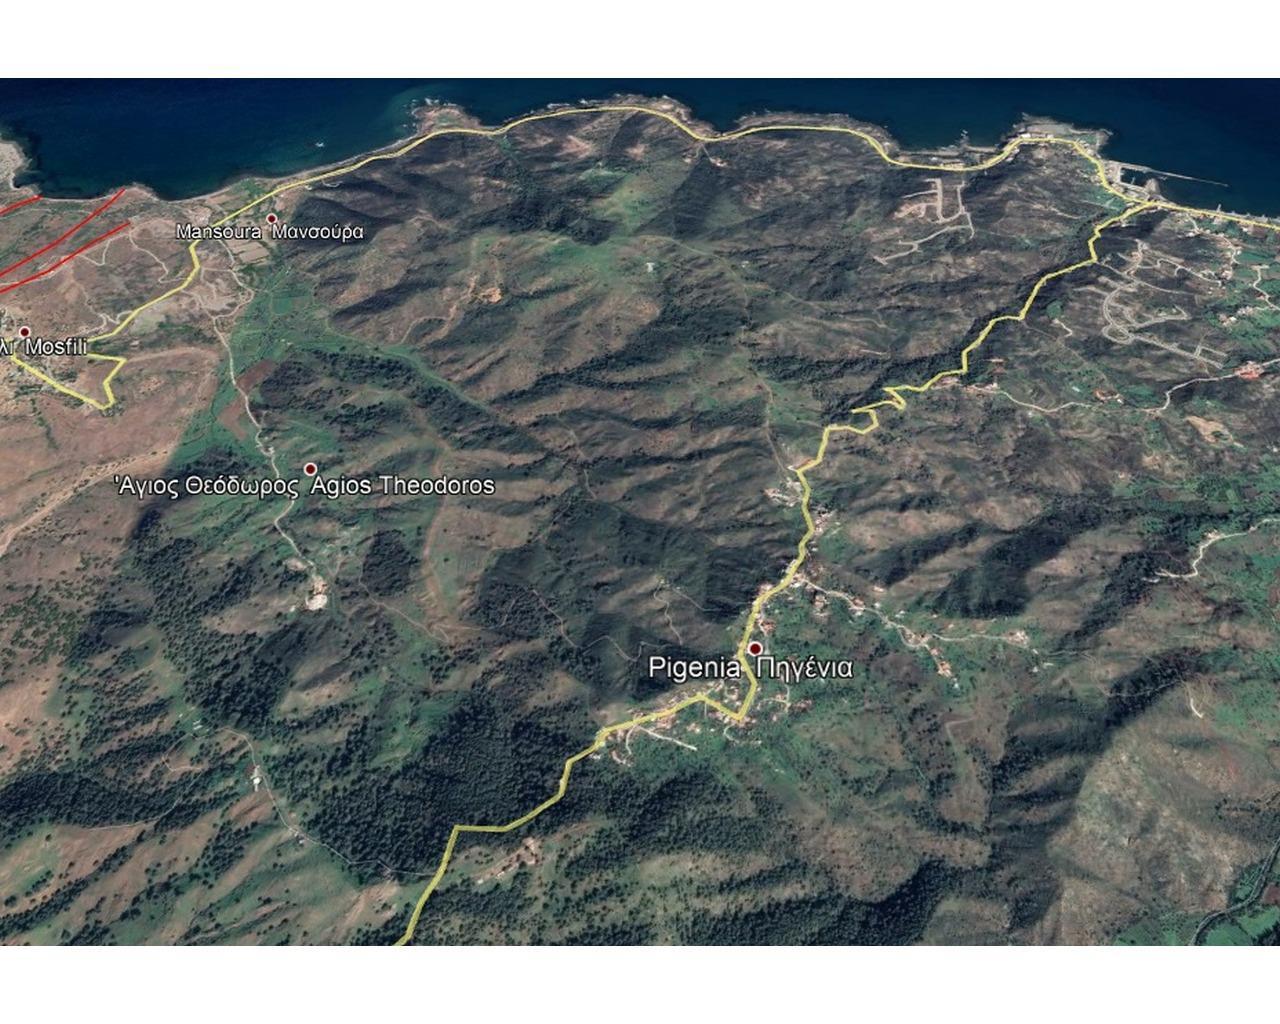 Land Nicosia(Pigenia)  710 SqMt for sale